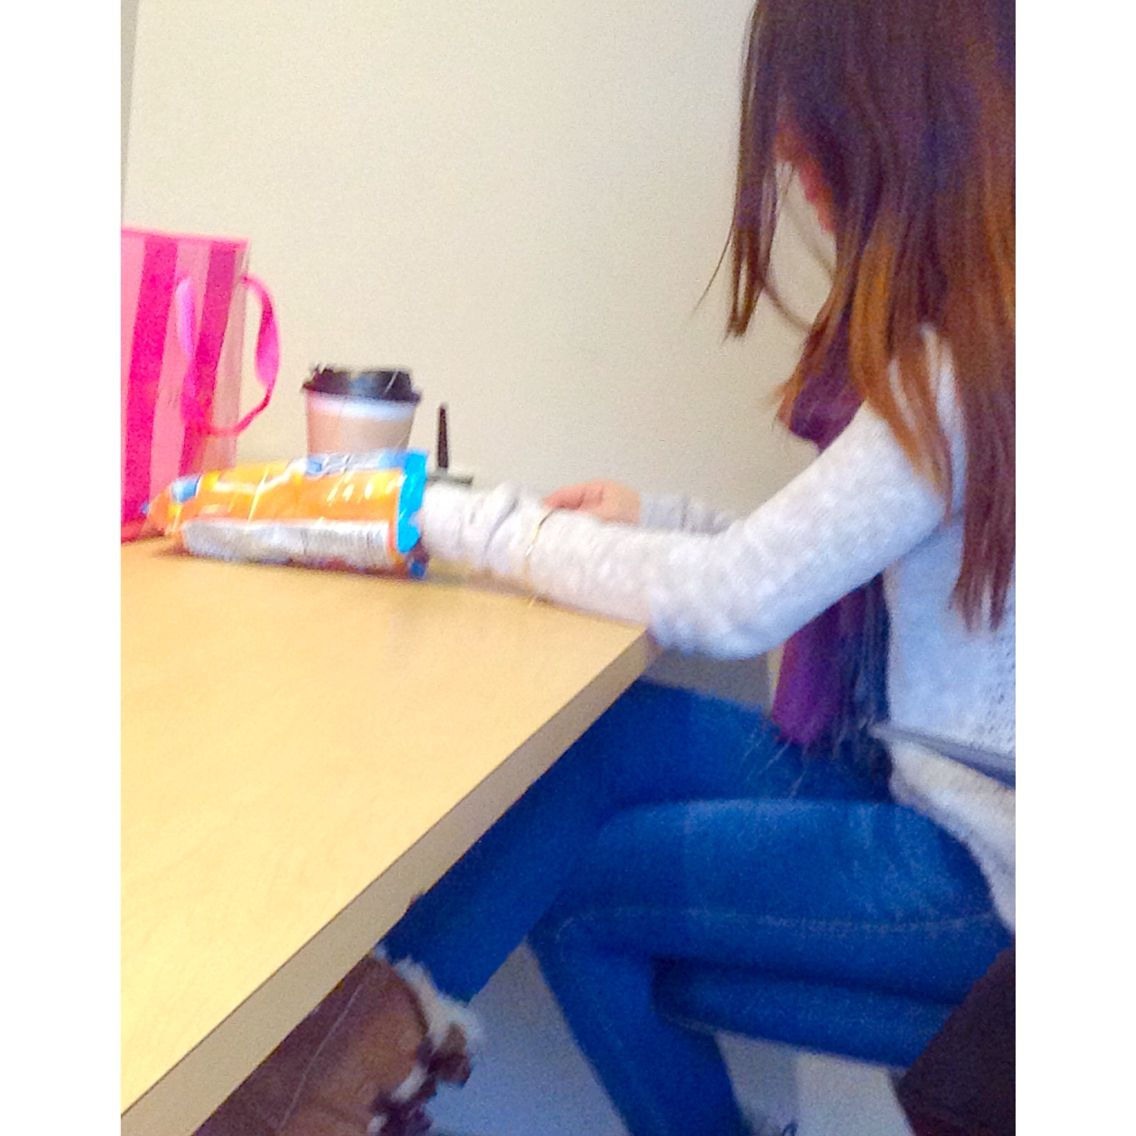 At school eating my #questproteinchips